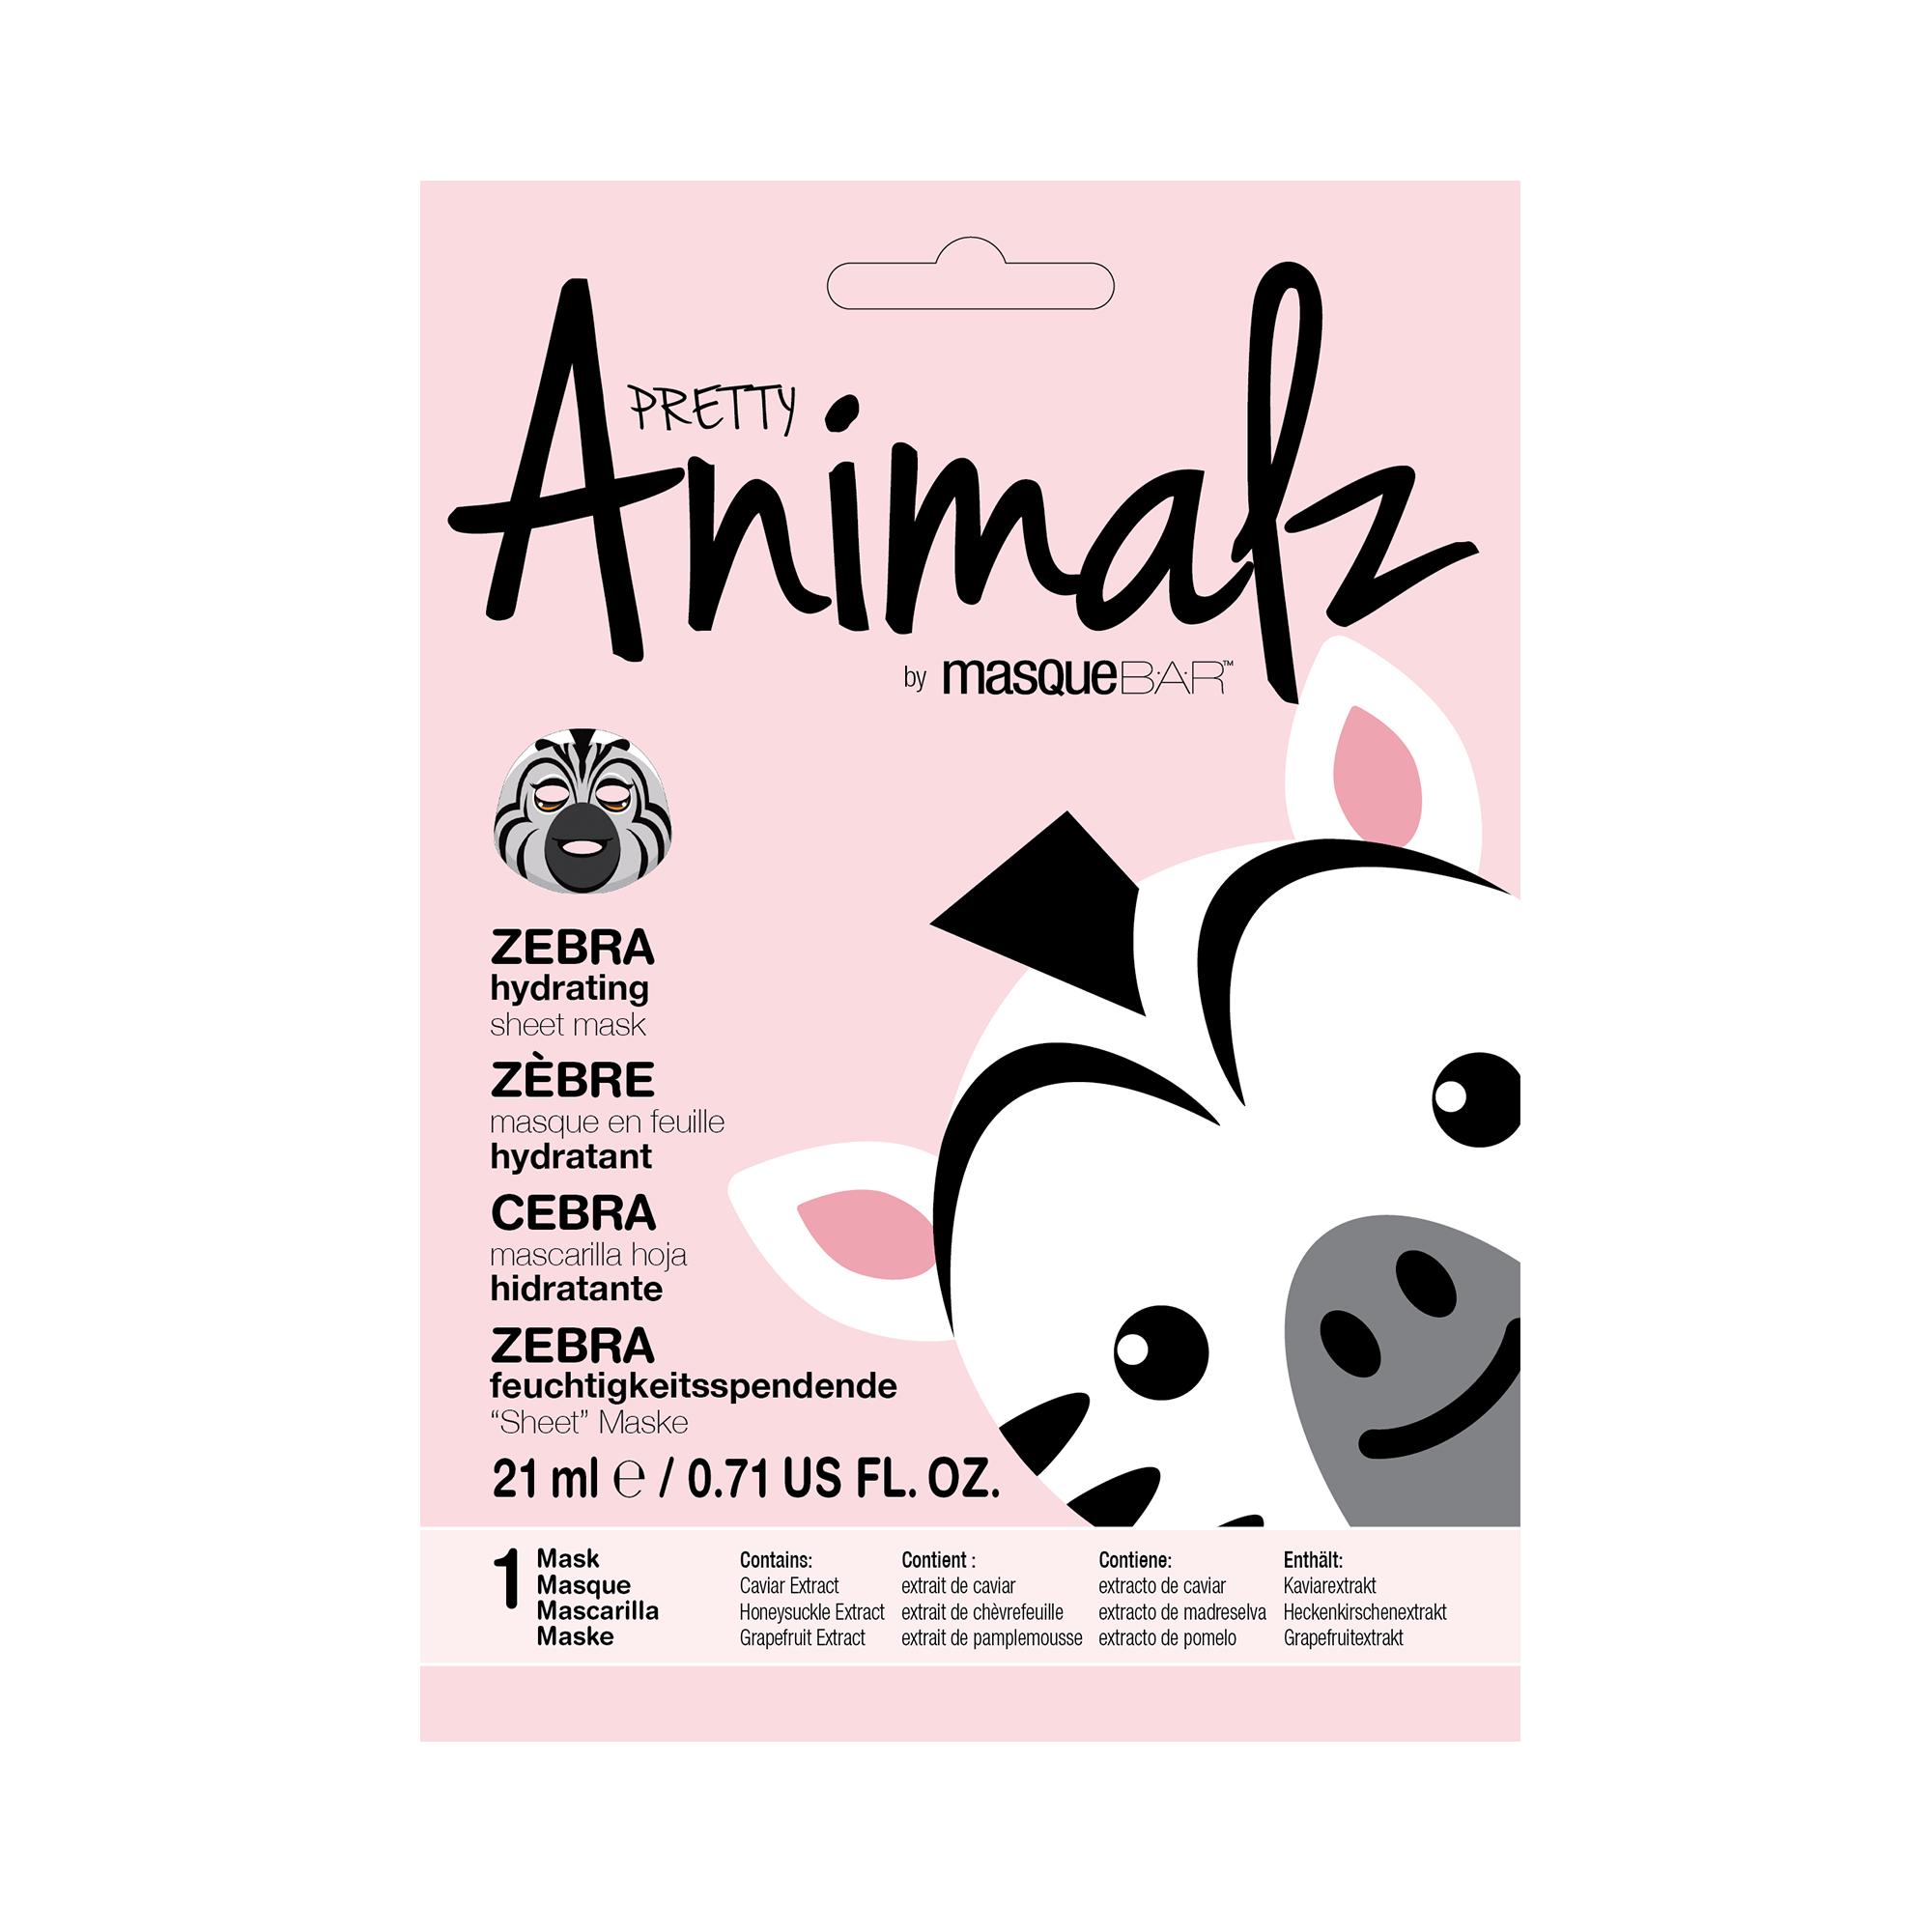 Animalz Zebra Sheet Mask masque B.A.R Animalz Zebra Sheet Mask Facial masks